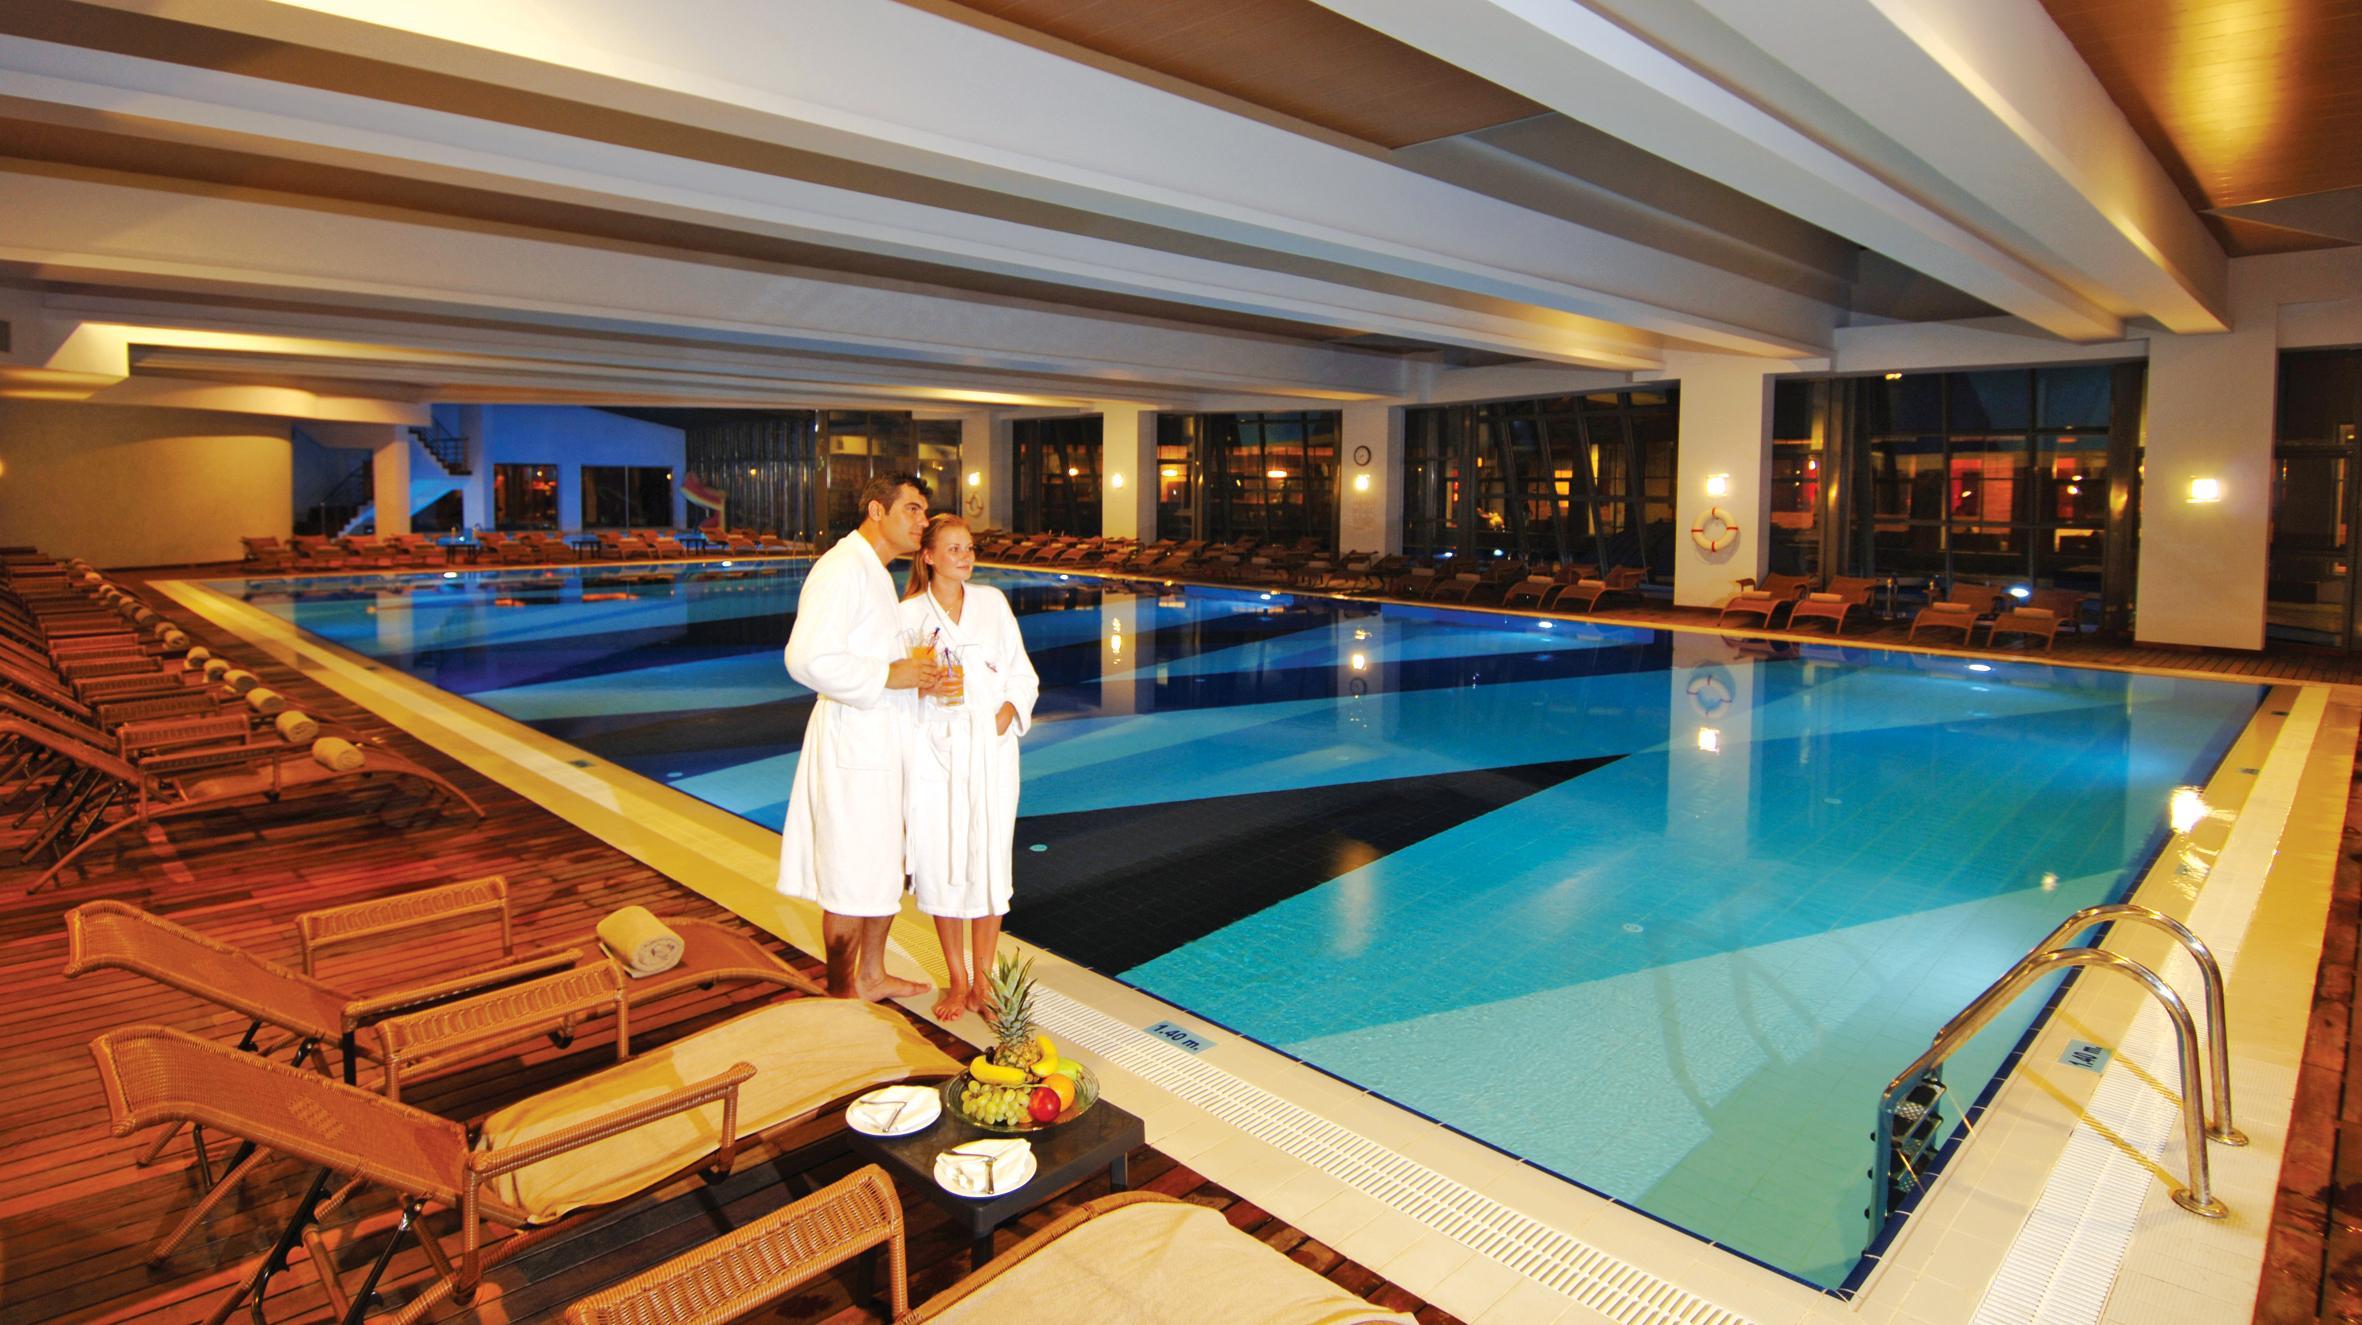 Фото отеля Лимарк Лара Делюкс